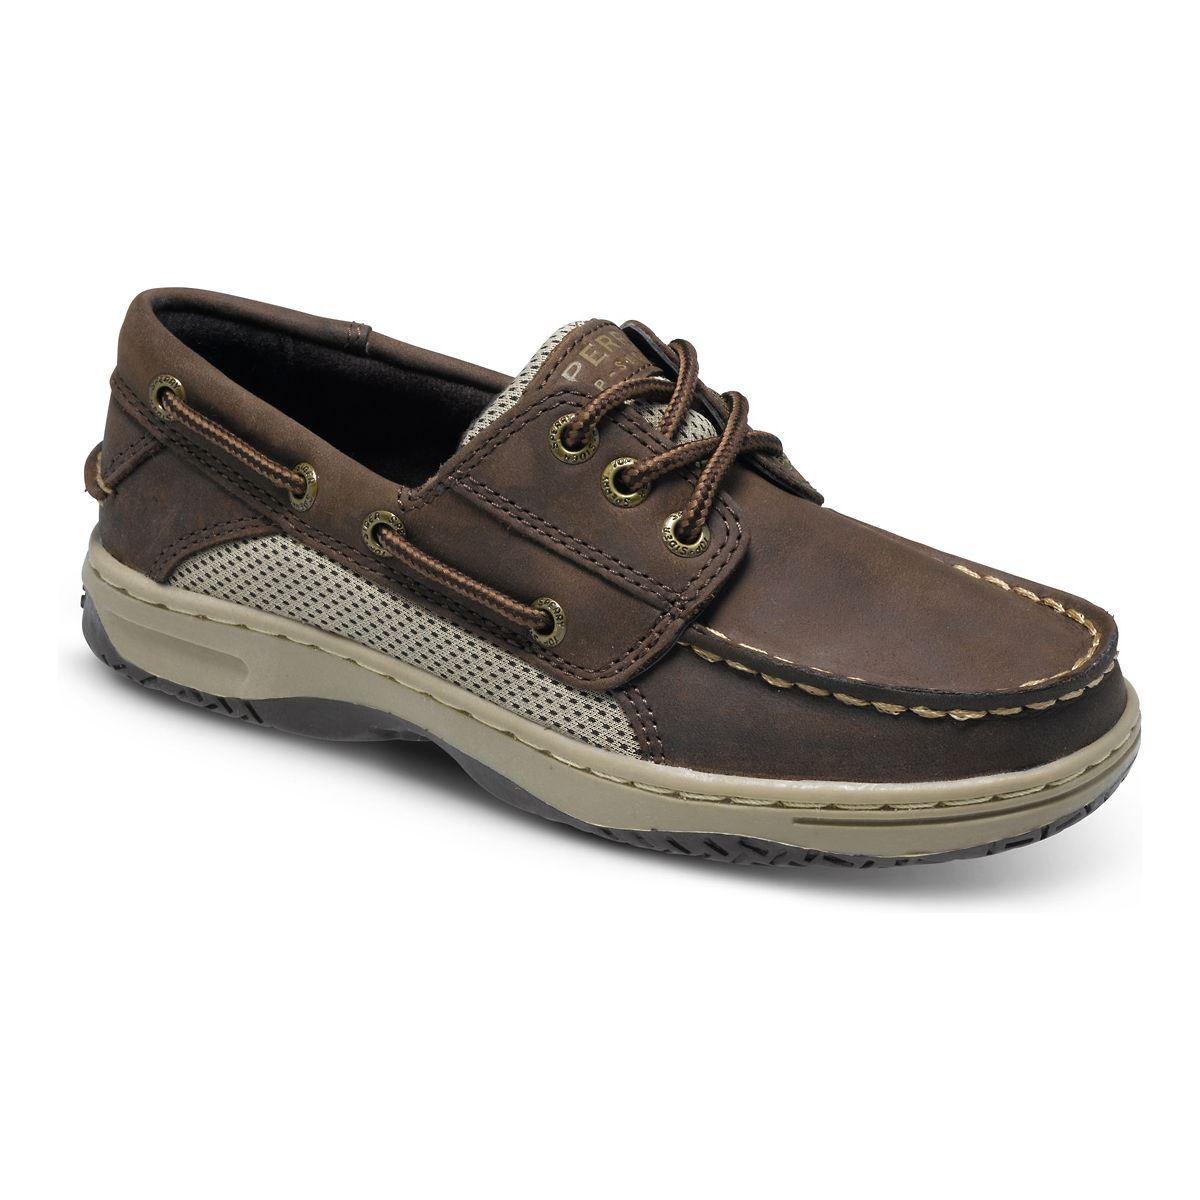 sperry top sider billfish boat shoe ebay